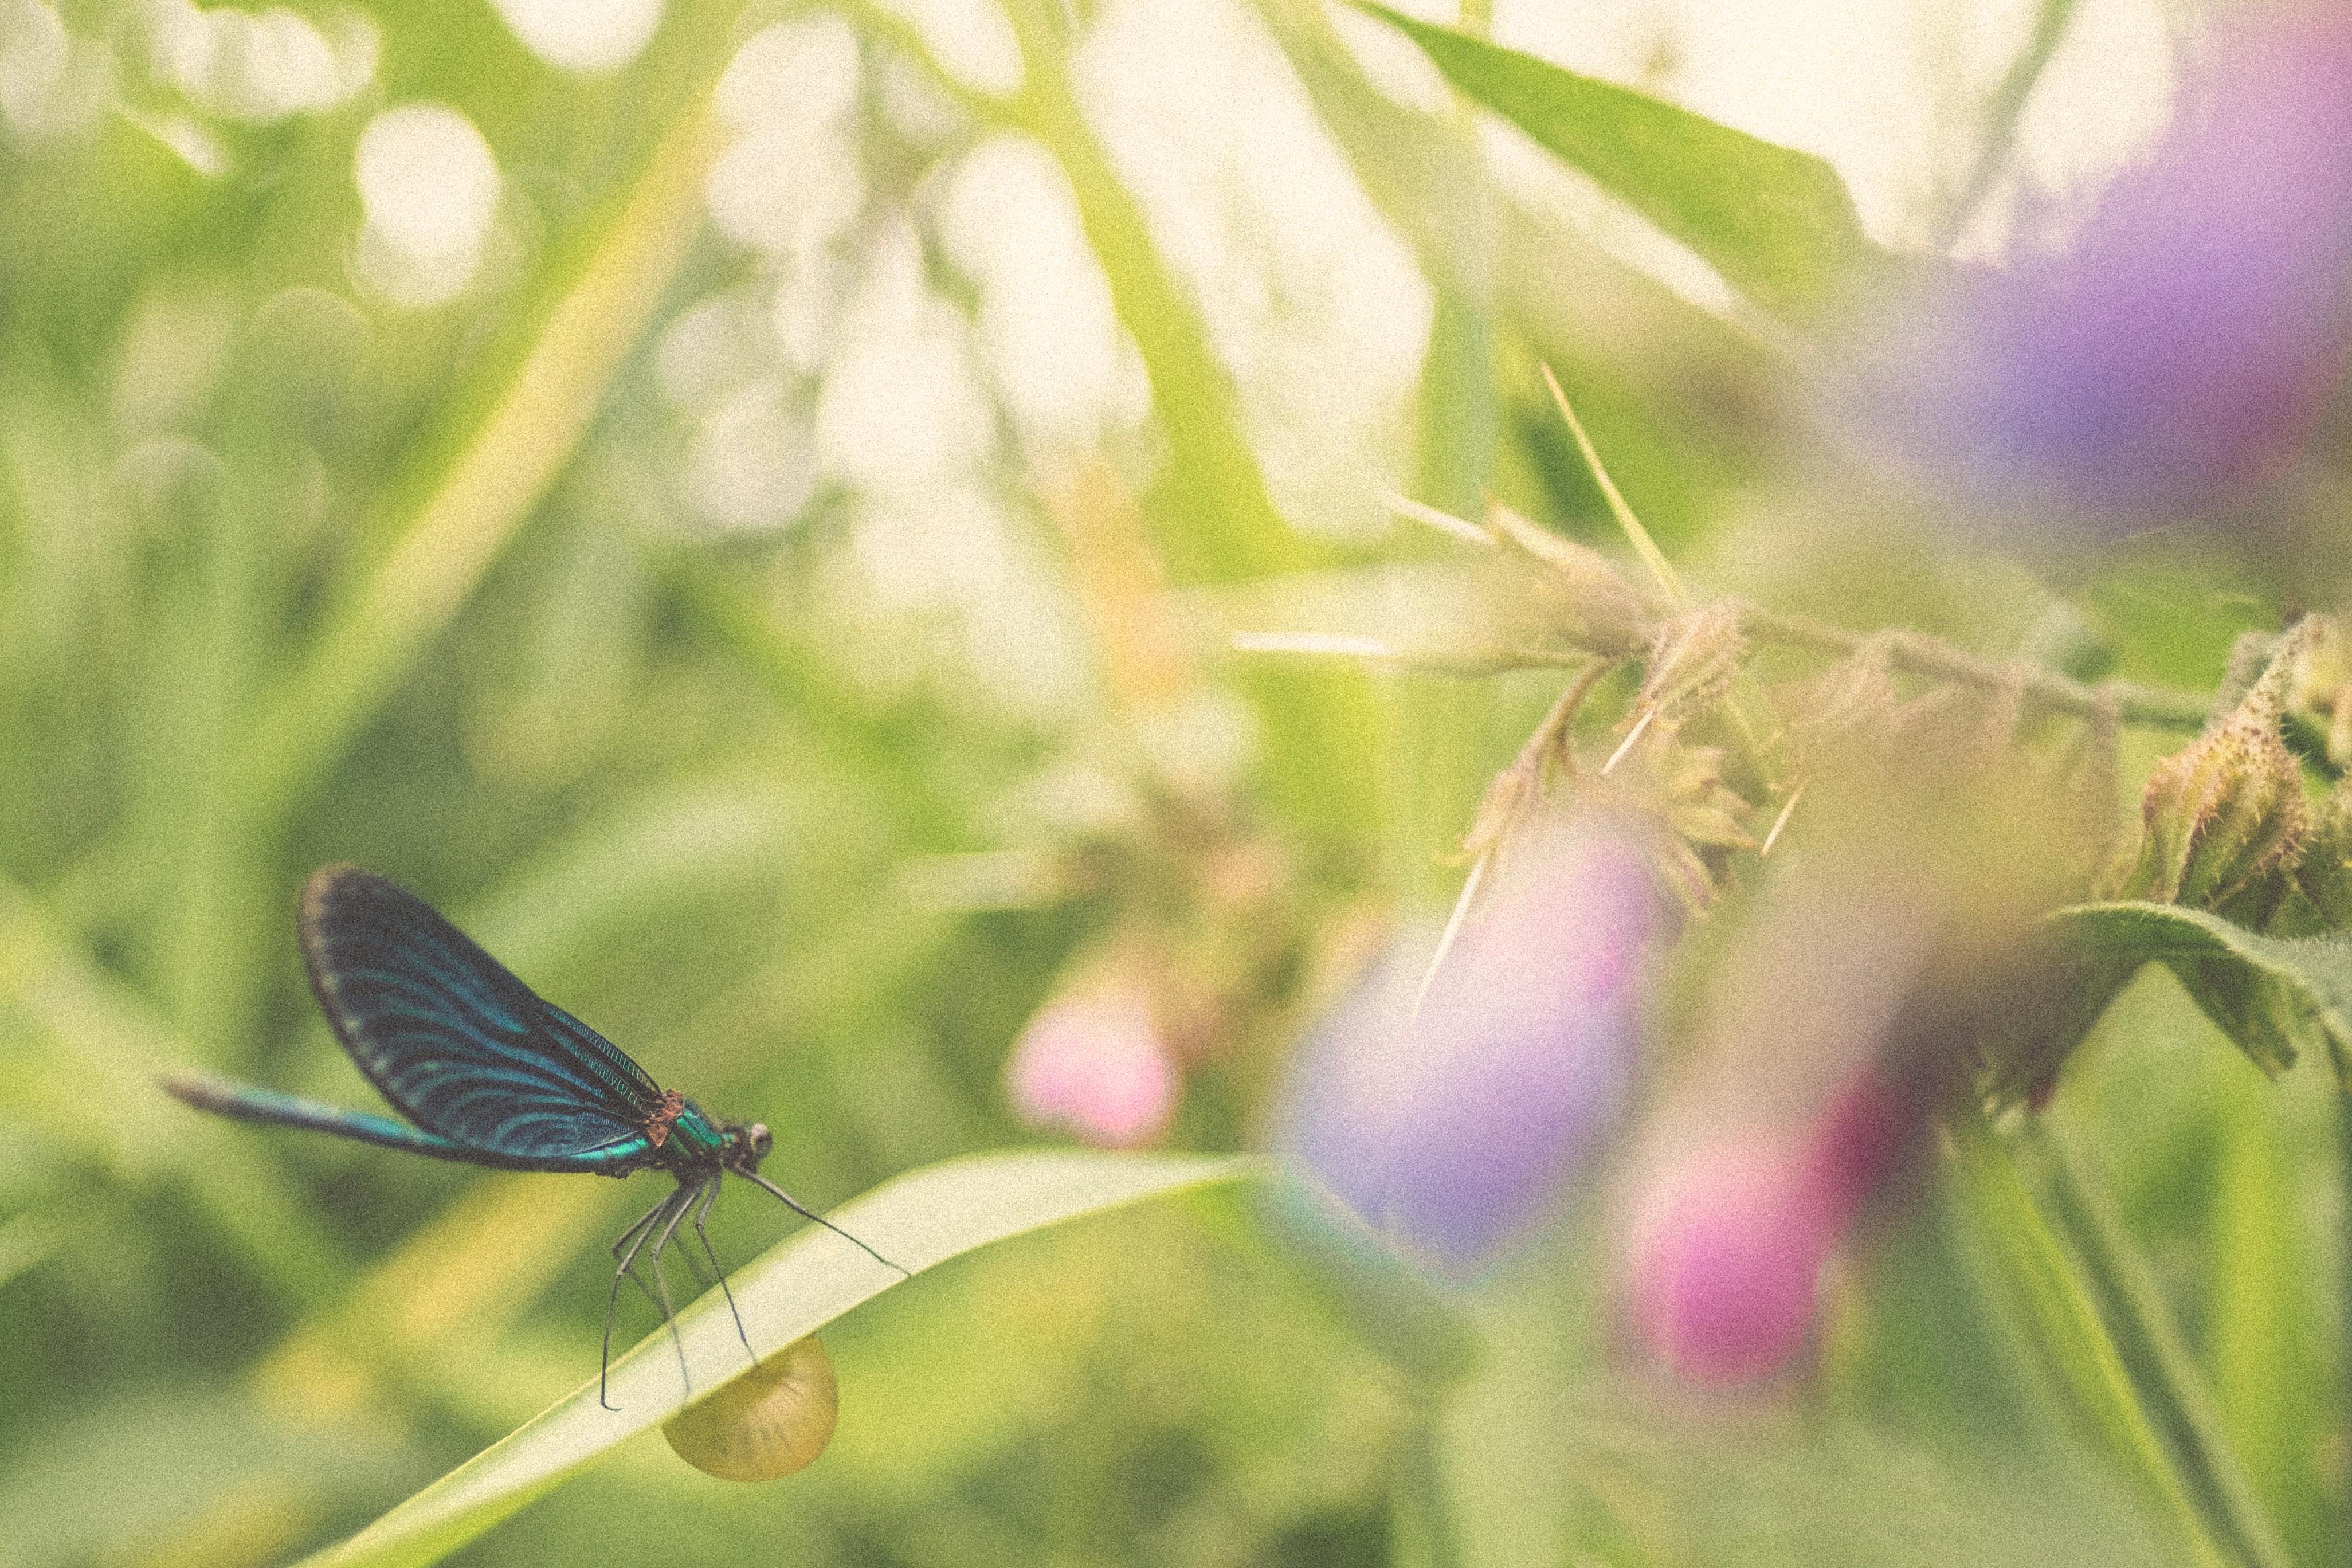 My Daughter Sends Dragonflies